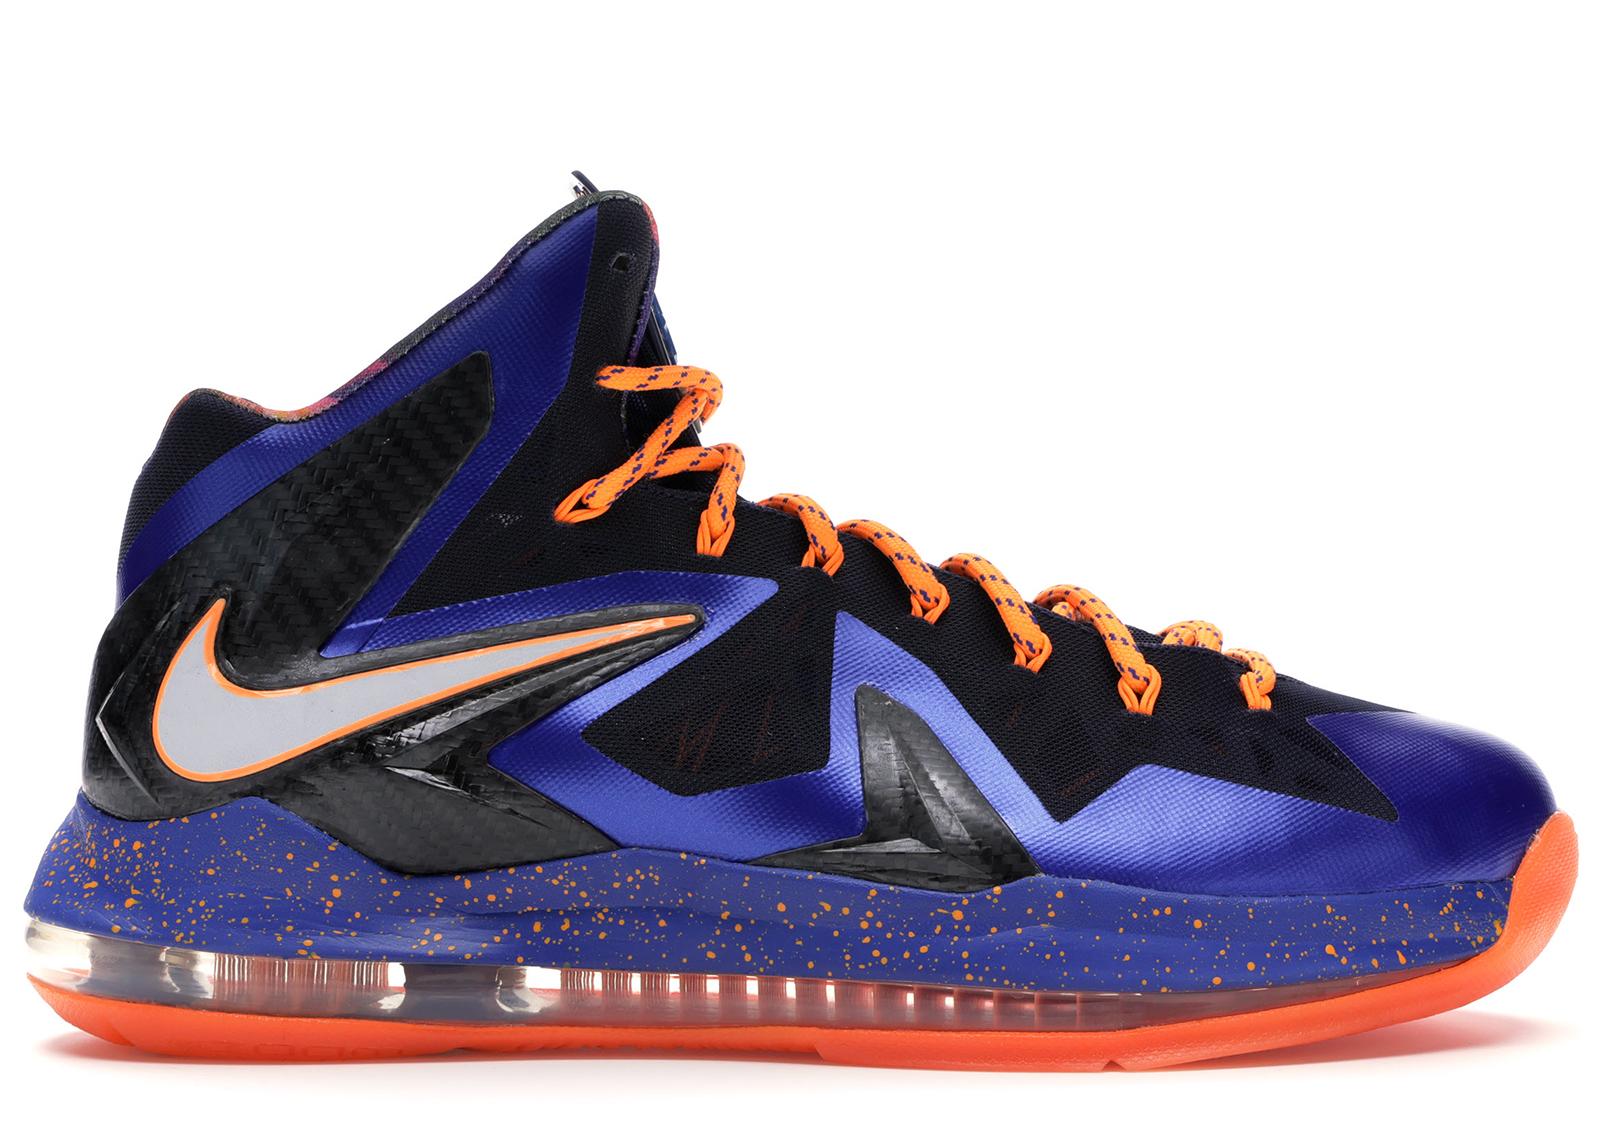 Nike LeBron X Elite Superhero - 579827-400